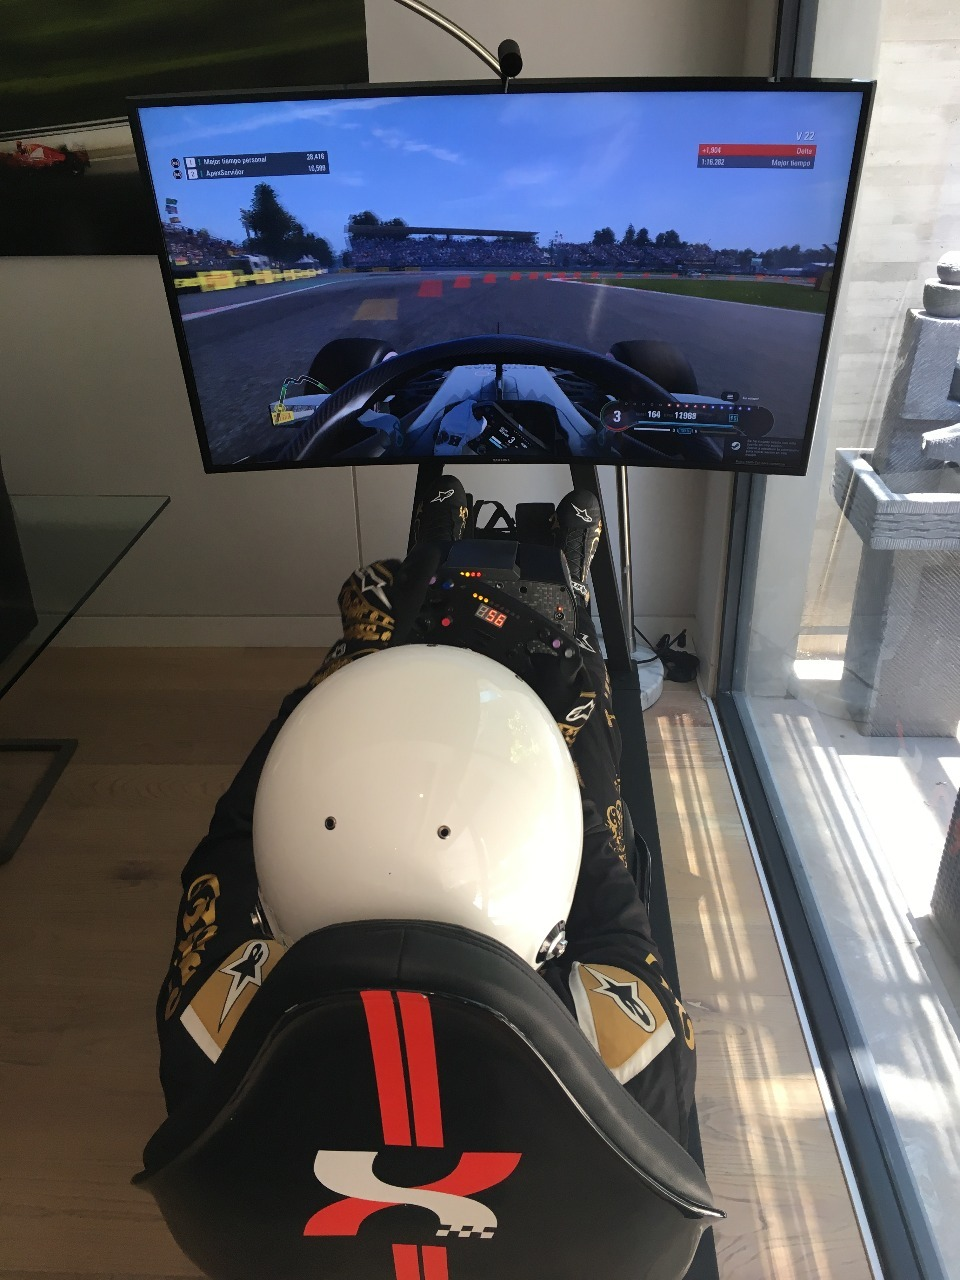 ¿Eres fan de la Fórmula 1? ¡Te llevamos al primer simulador profesional en México!